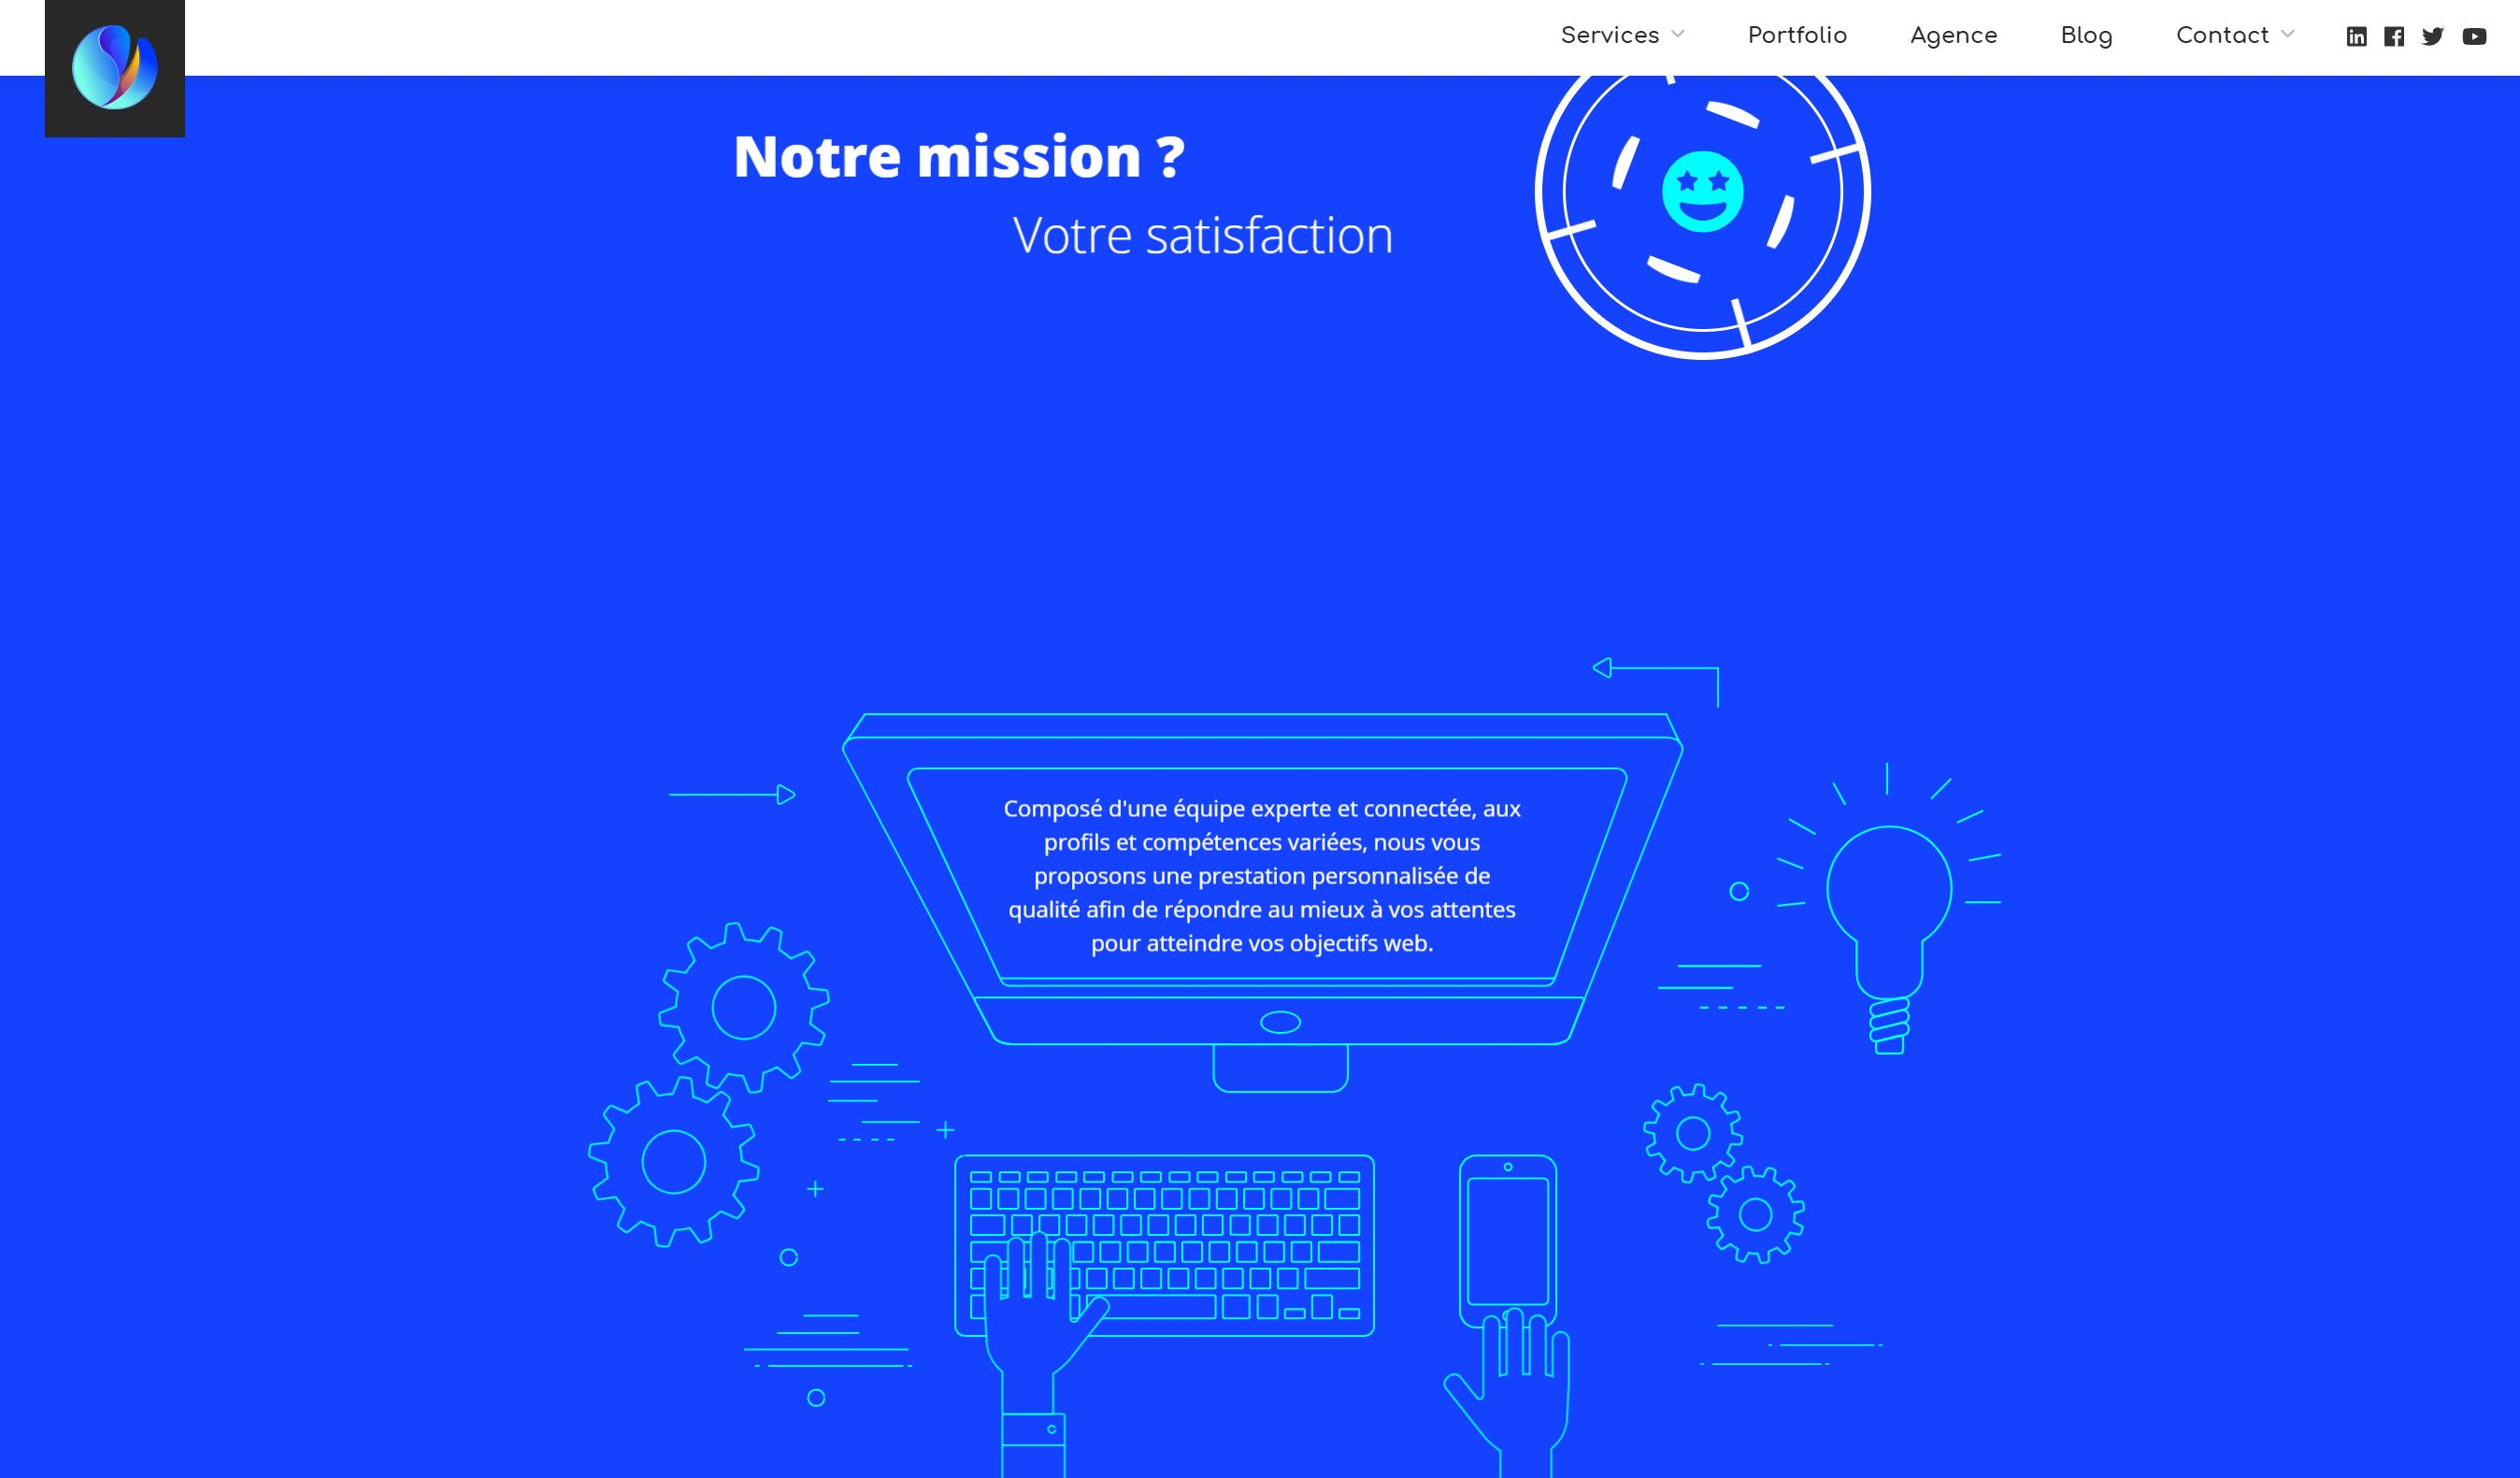 site-web-agence-wordpress-home-page